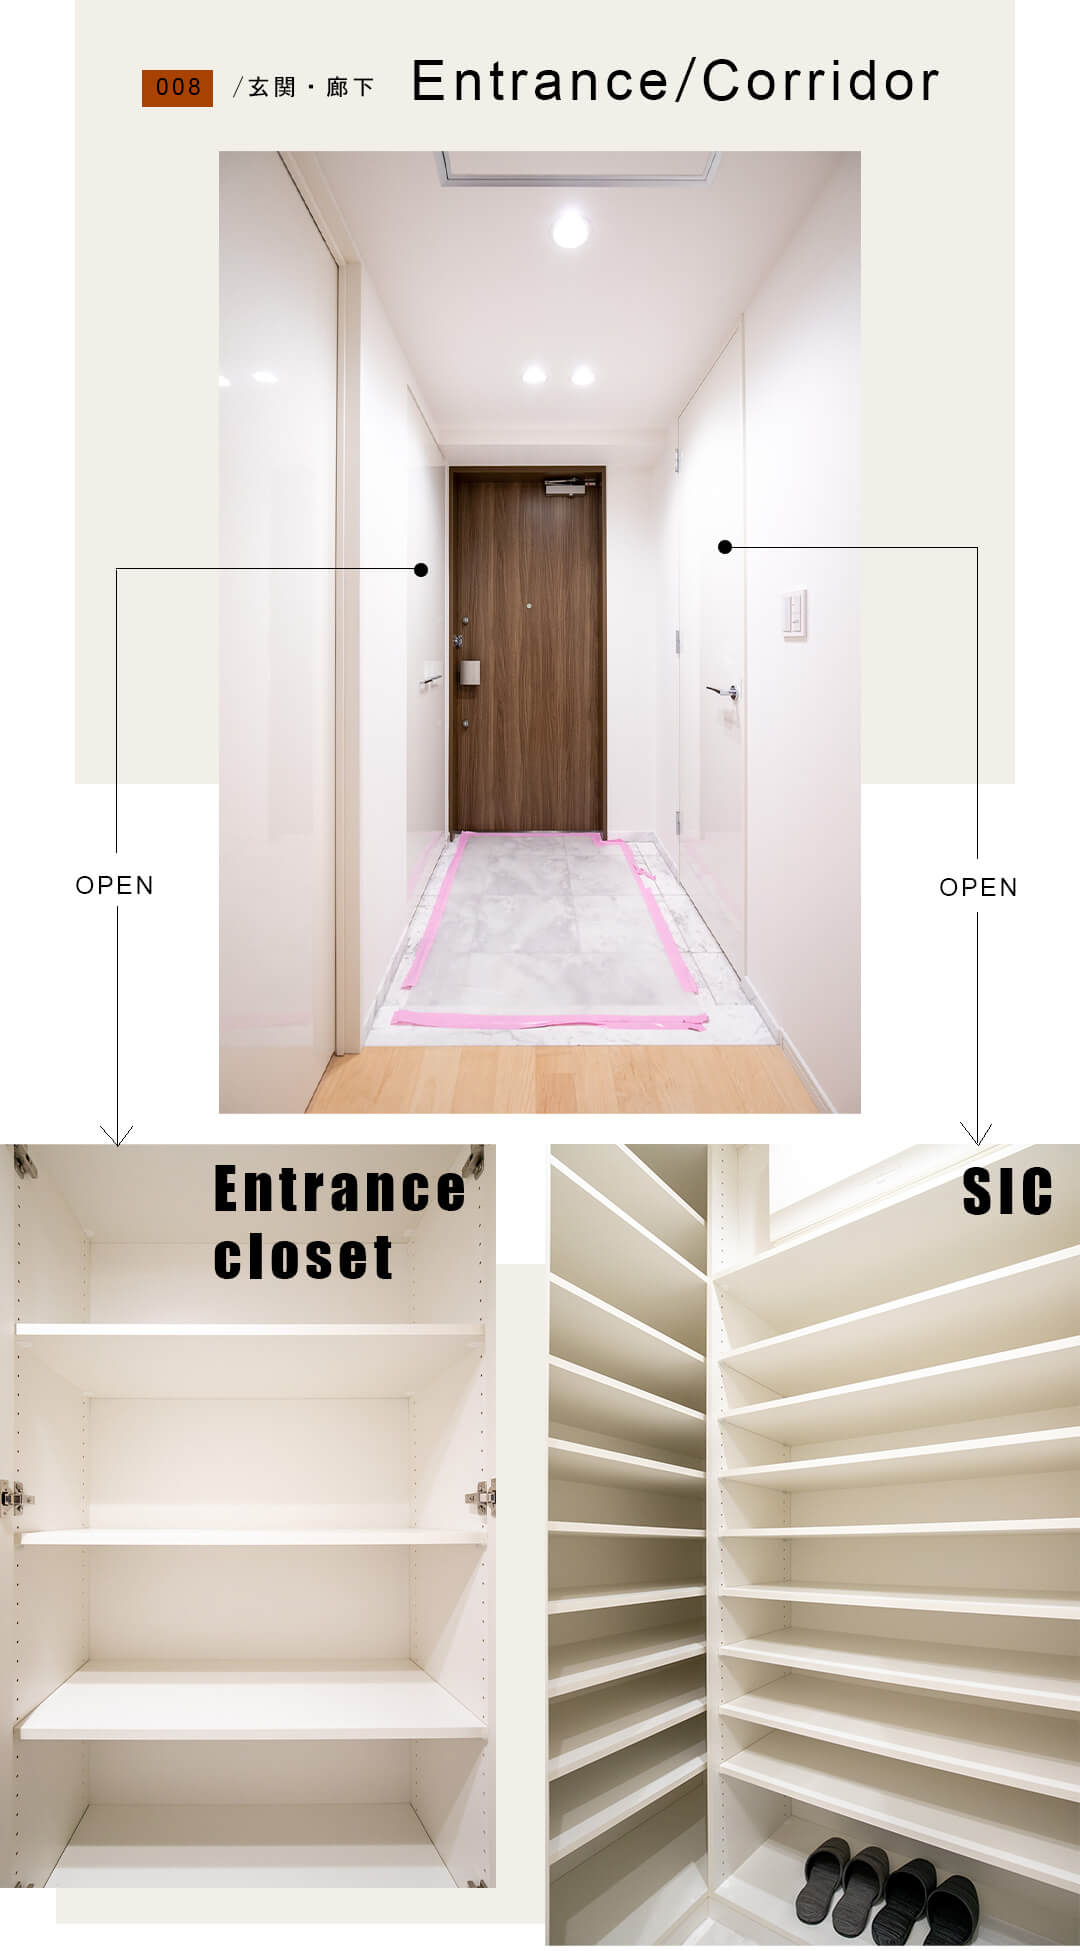 008玄関,廊下,Entrancec,orridor